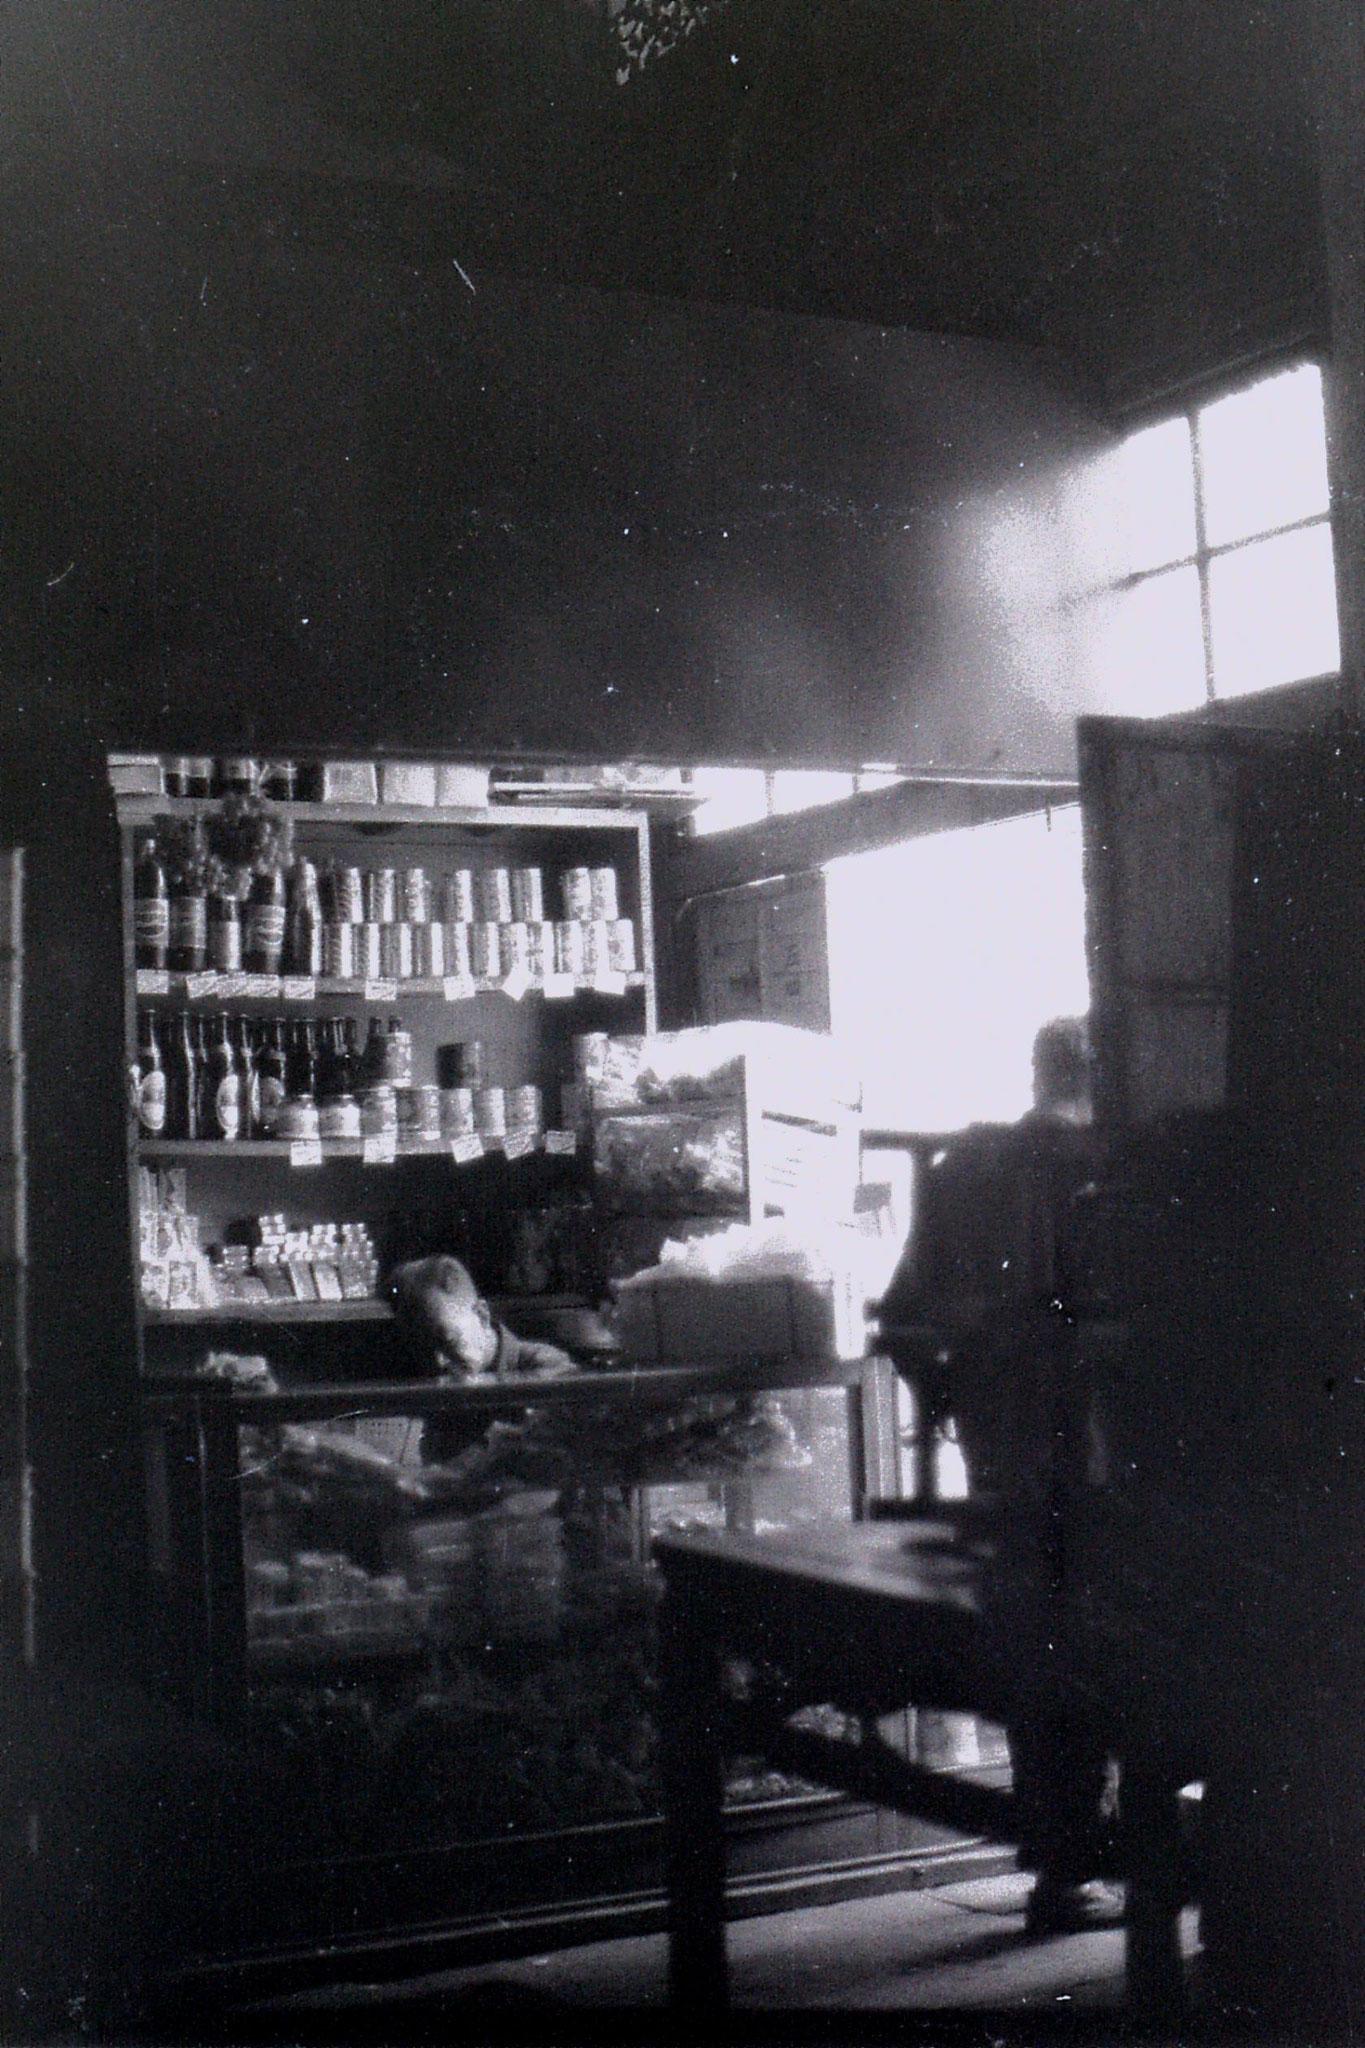 24/6/1989: 7: kiosk